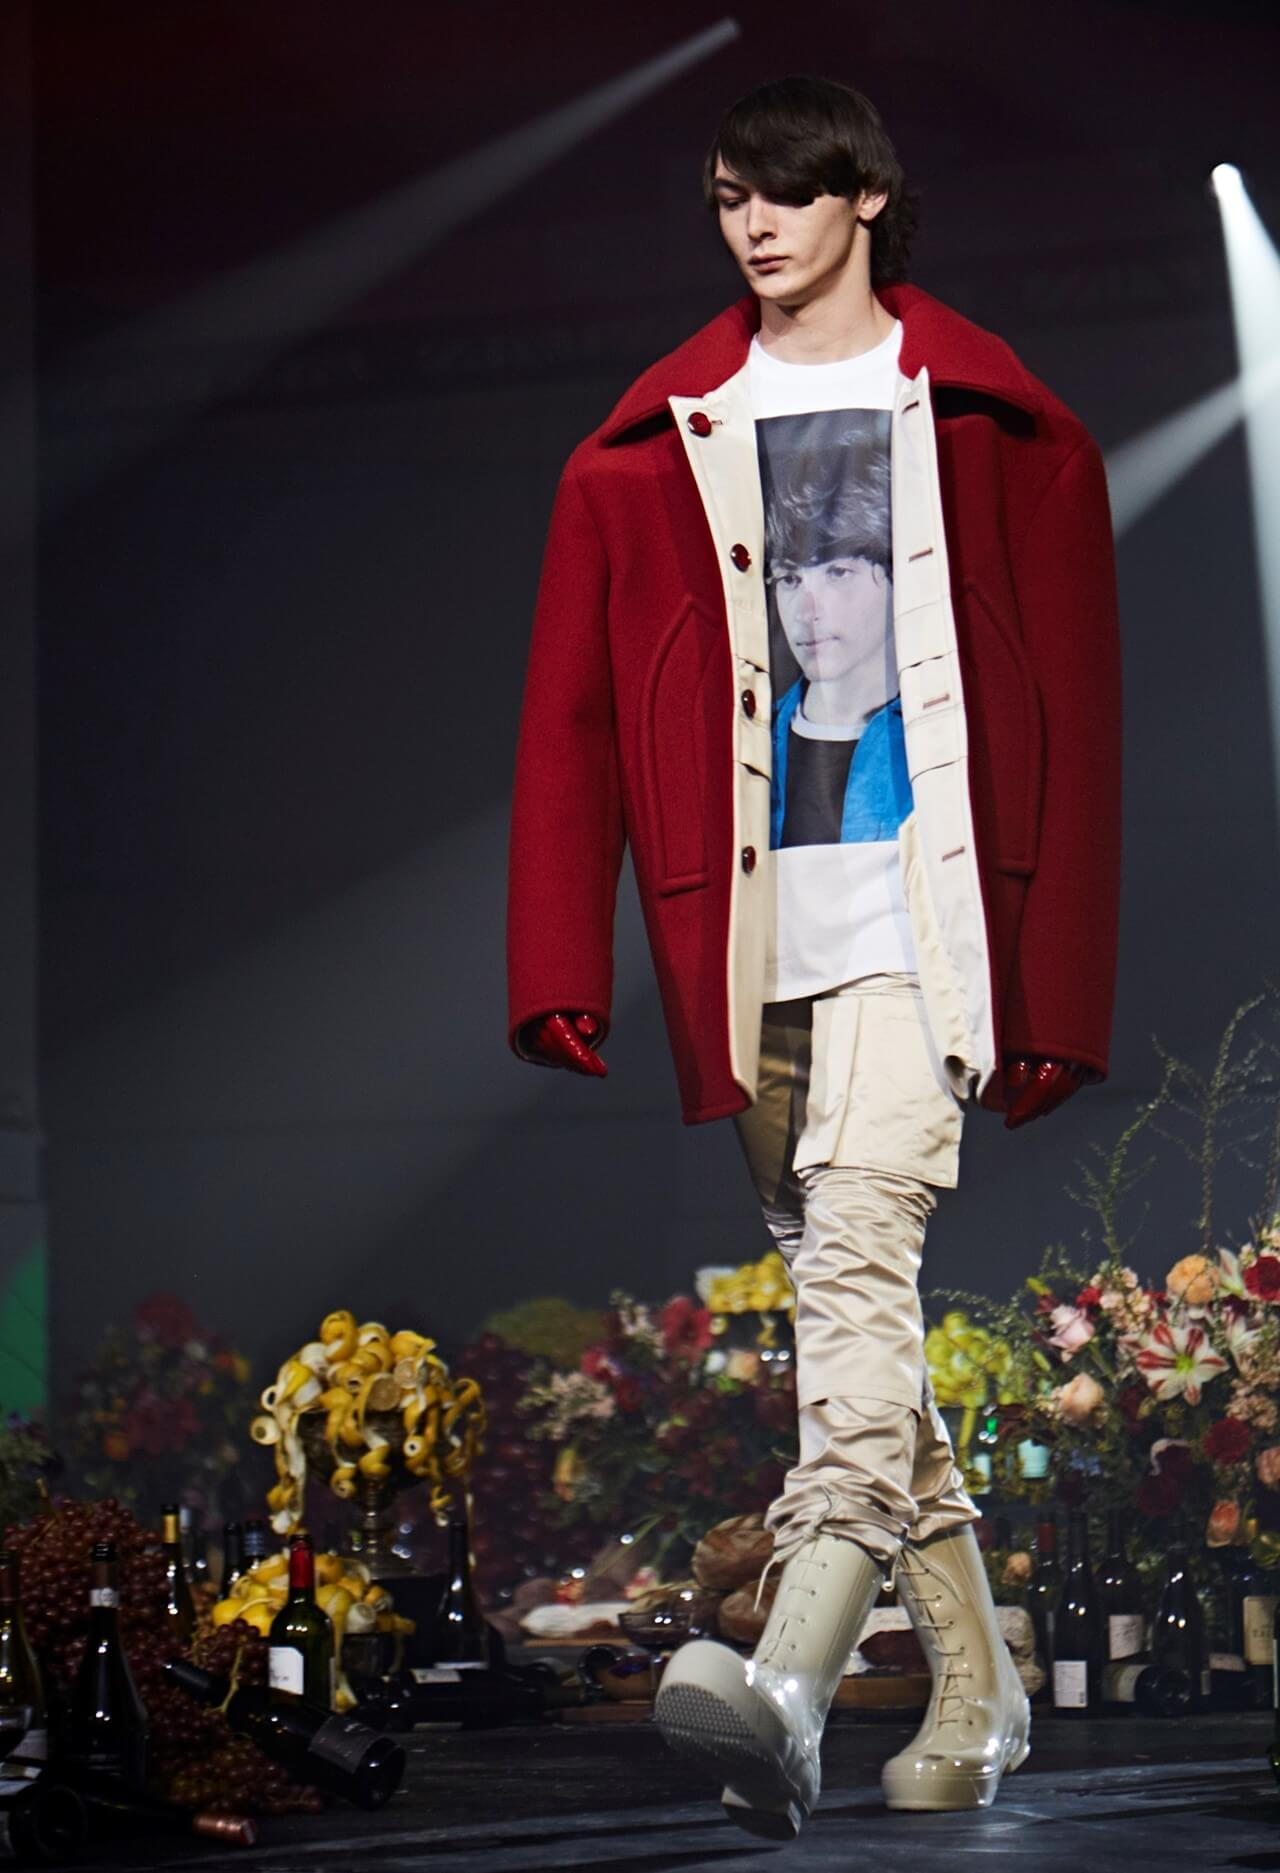 Raf Simons x Calvin Klein AW 2018. Fotografía: JDee Allin.